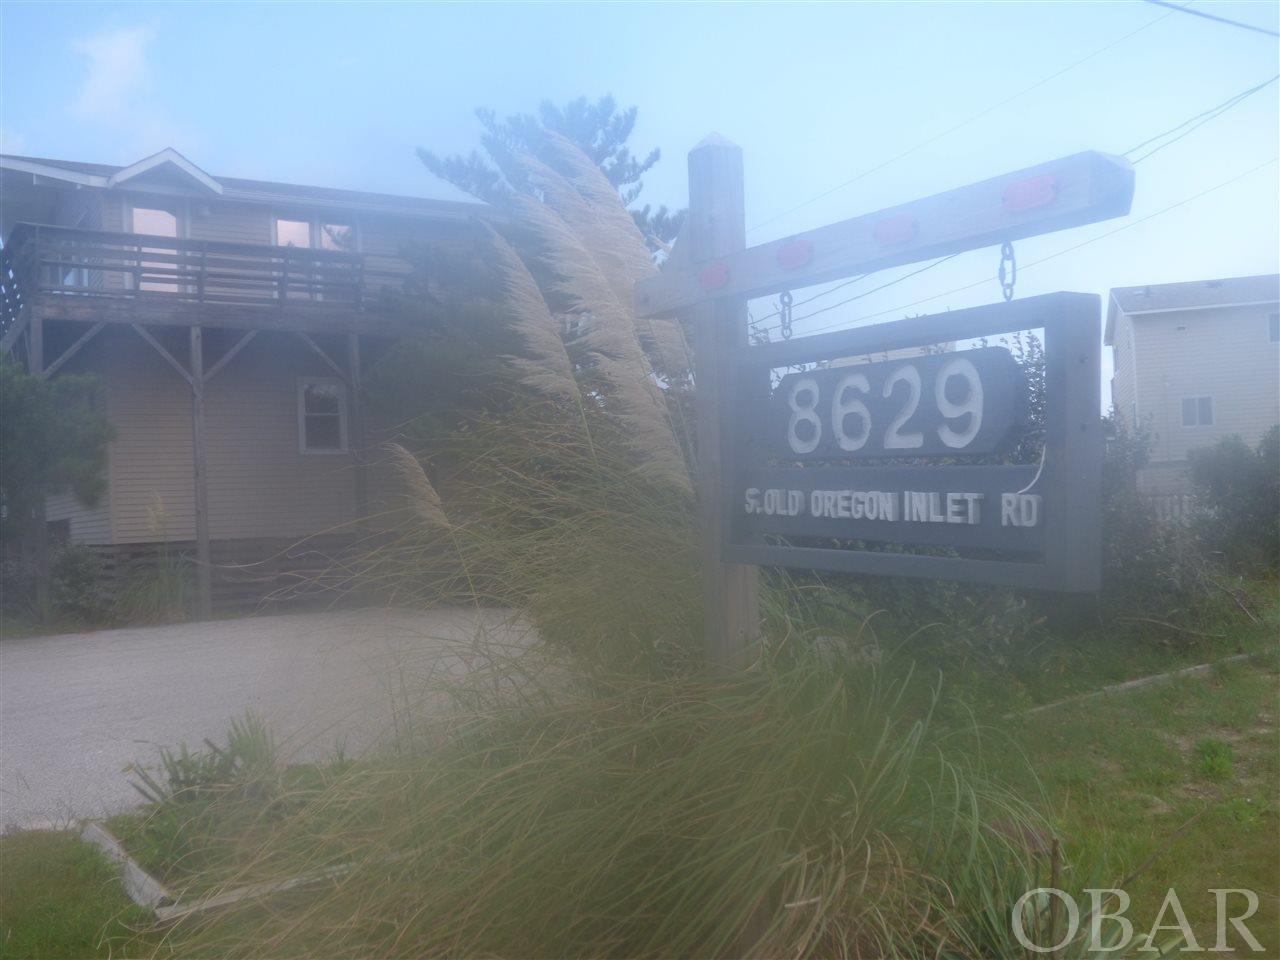 8629 S Old Oregon Inlet Road Lot Pt1, Nags Head, NC 27959